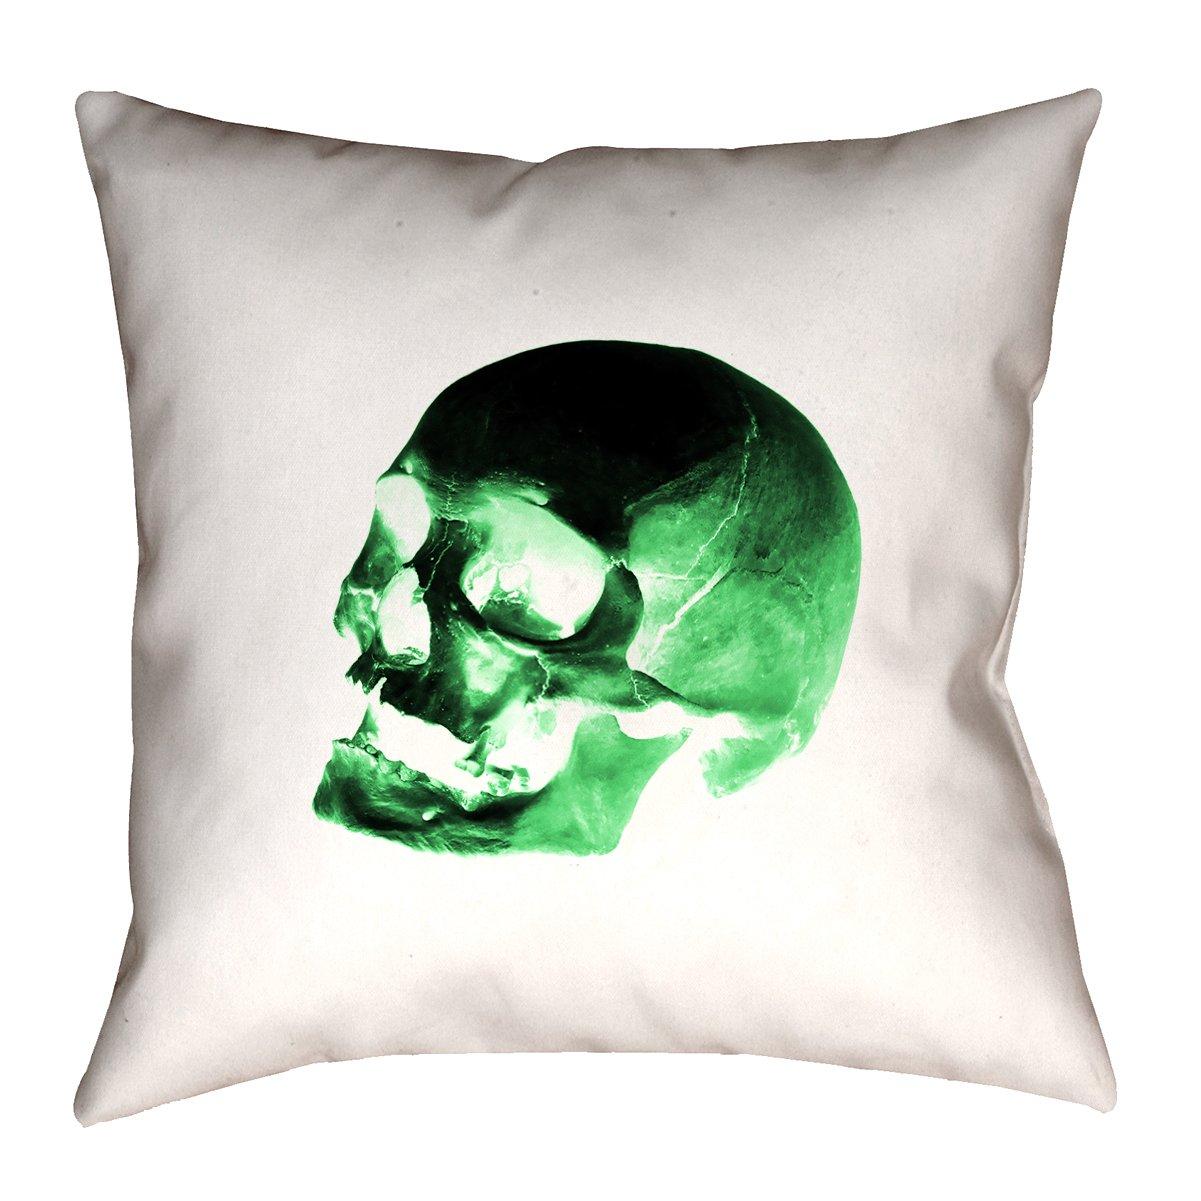 ArtVerse Katelyn Smith 14 x 14 Spun Polyester Red Skull Pillow